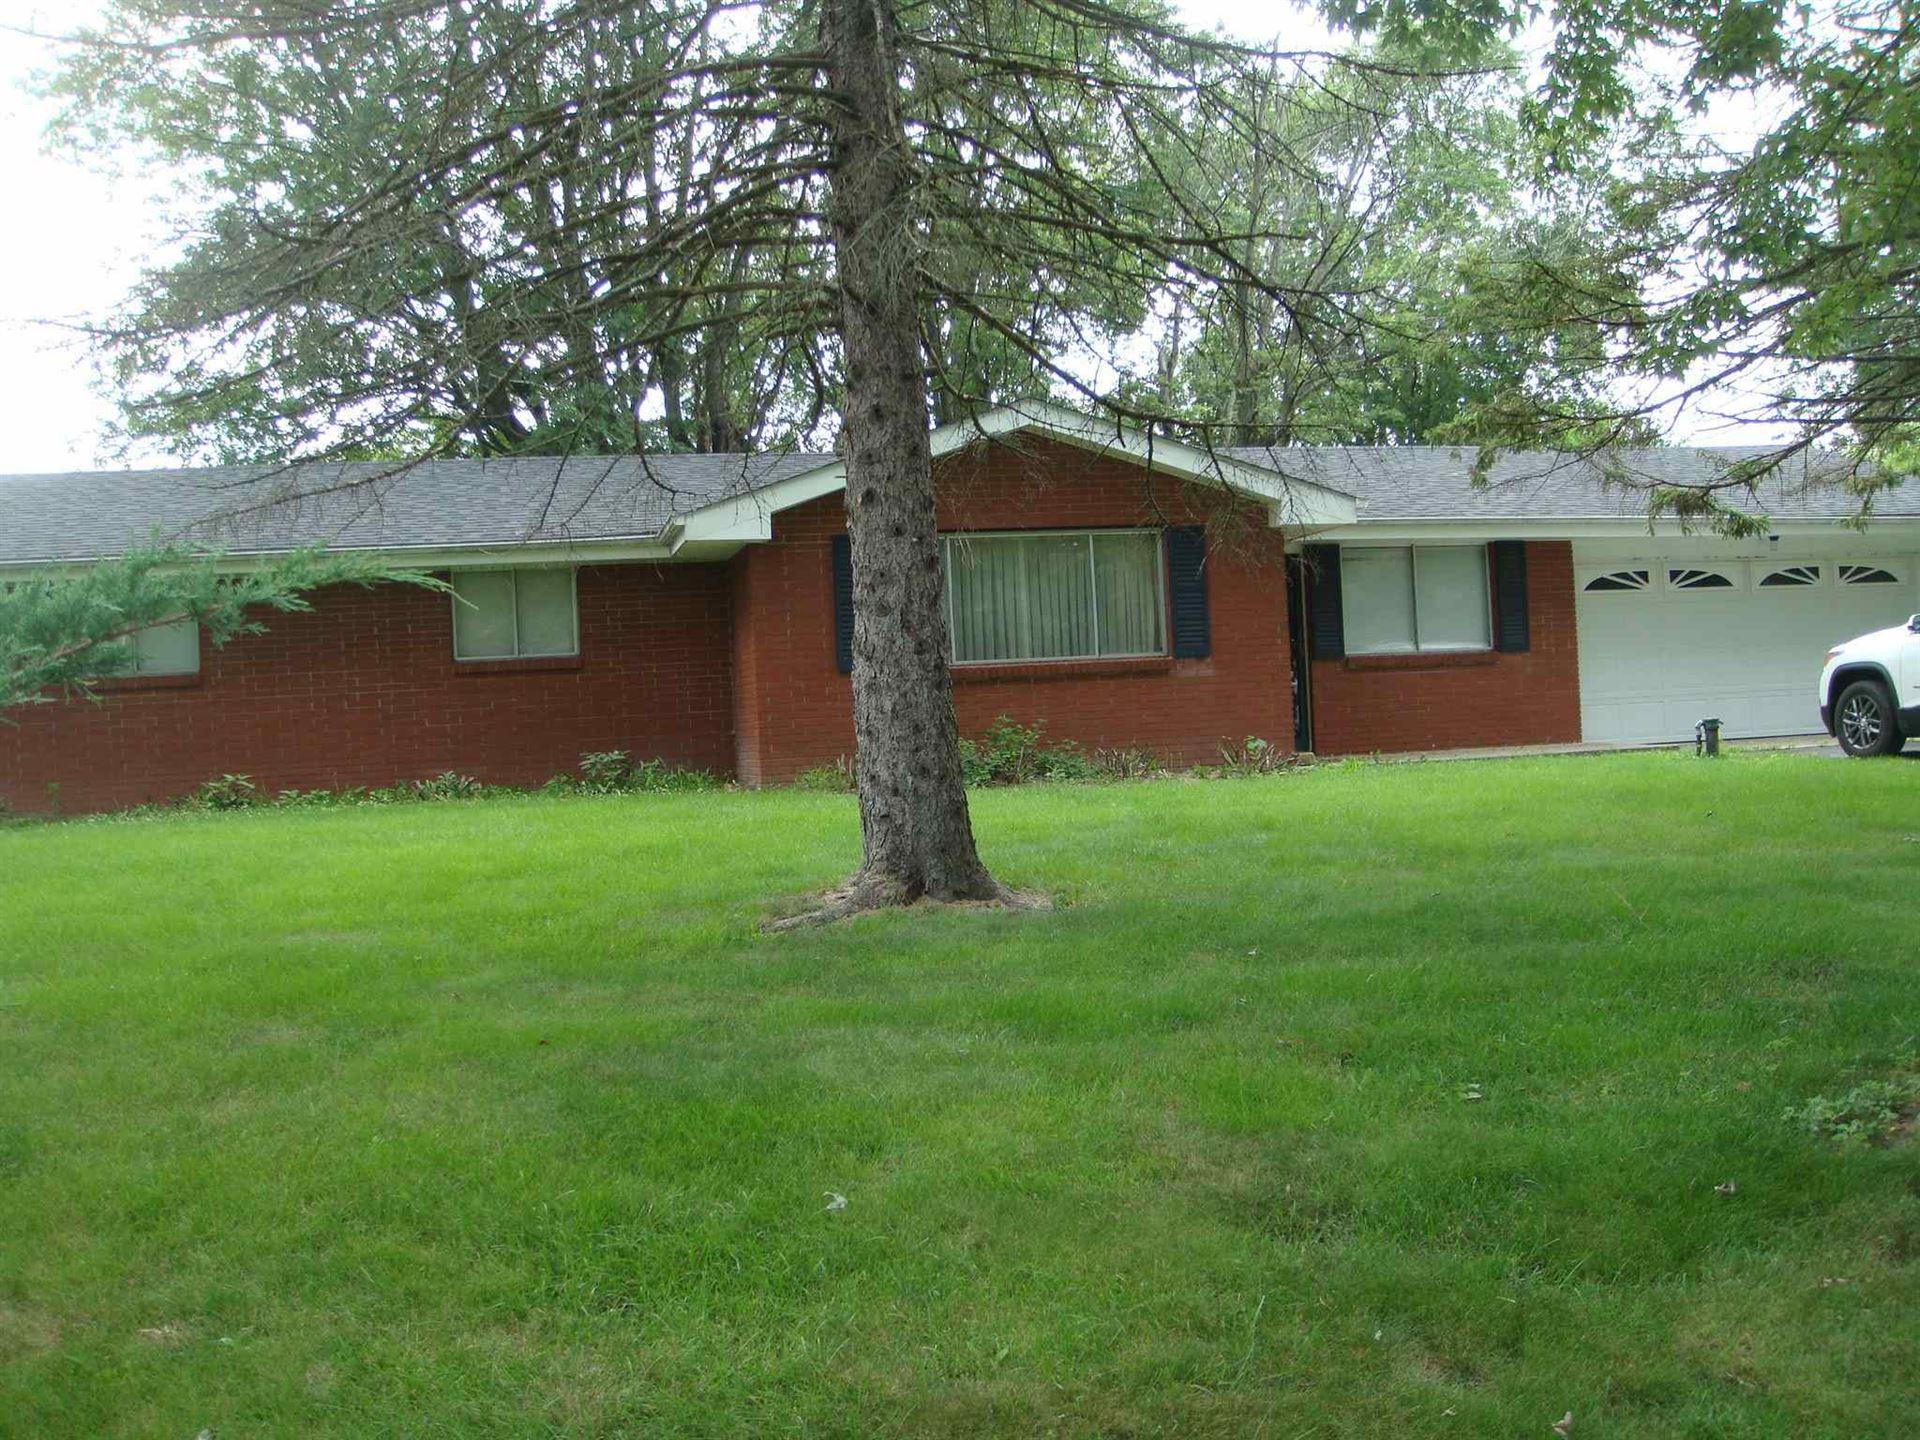 1701 PLEASANT Drive, Kokomo, IN 46902 - MLS#: 202130649